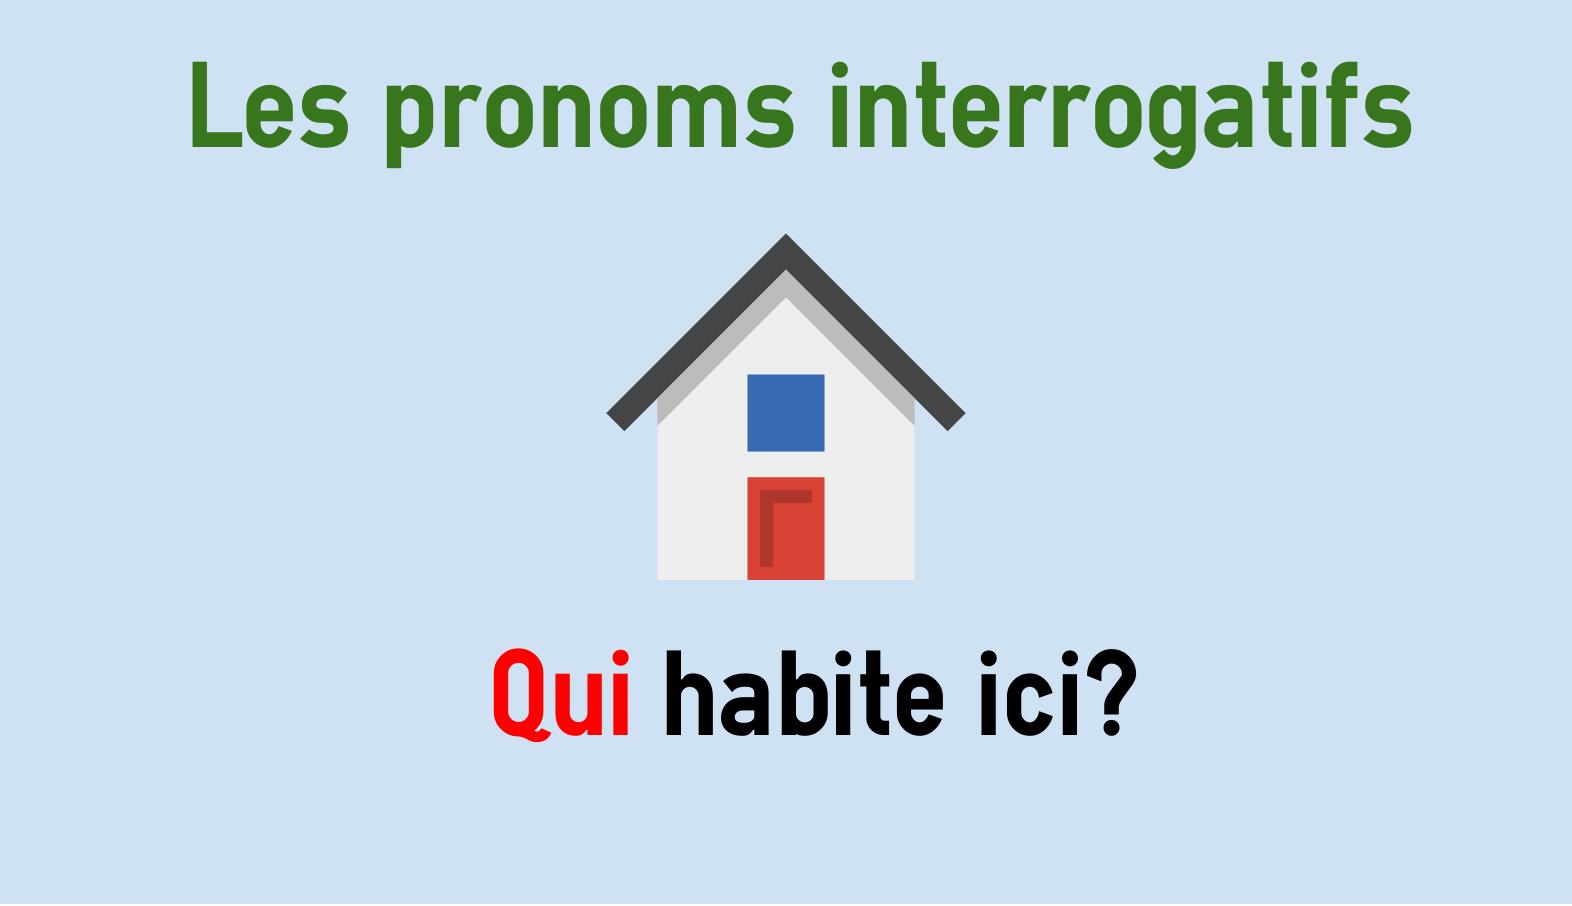 Französische Interrogativpronomen - qui, que, quoi